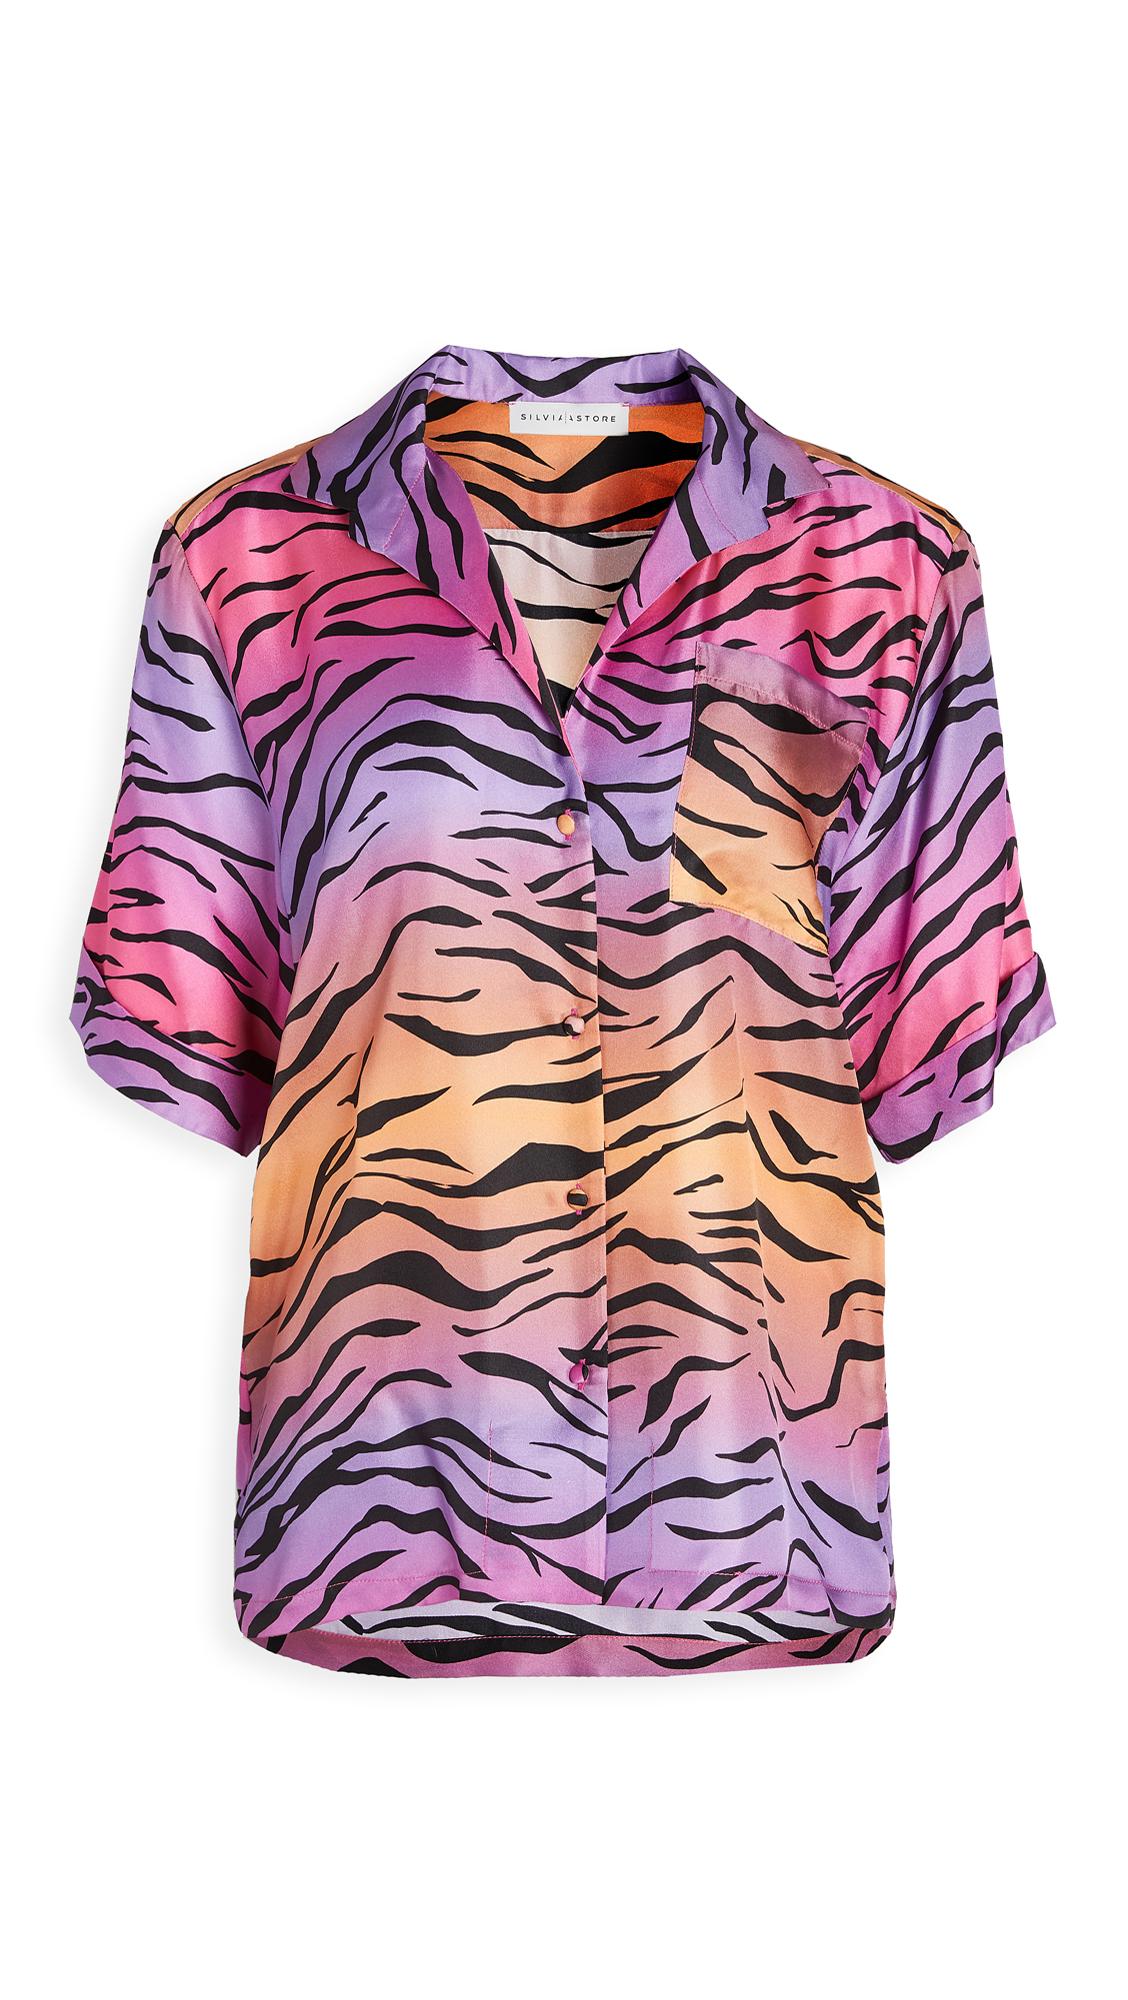 Silvia Astore Peggy Shirt - 30% Off Sale